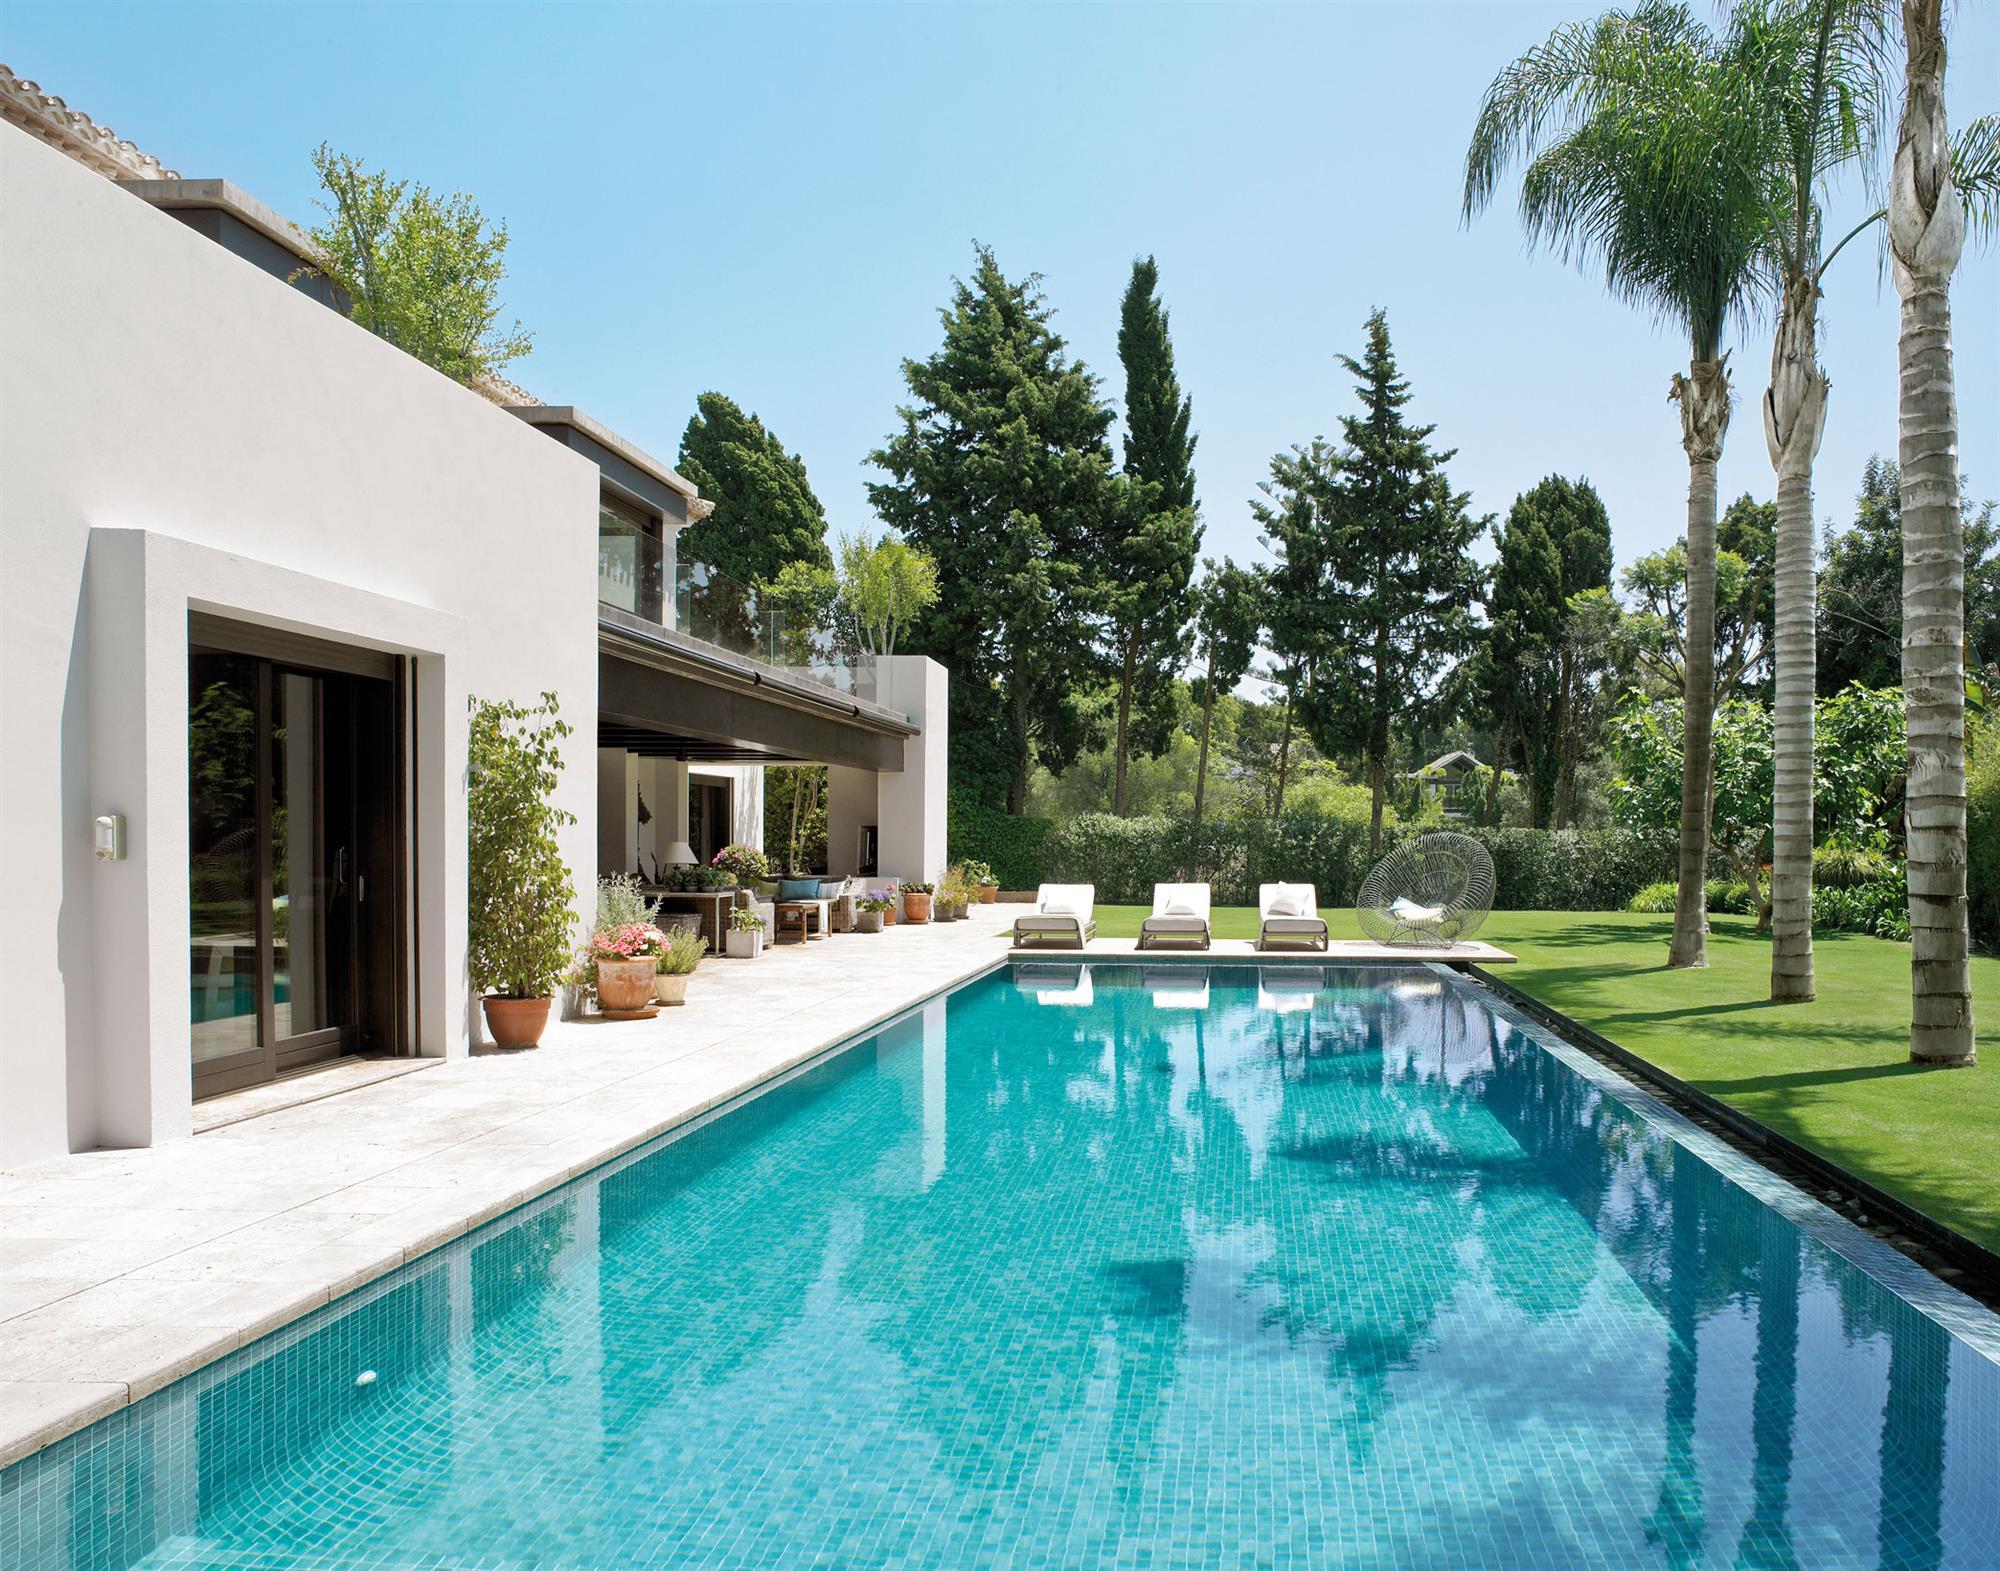 225 Fotos De Piscinas - Decoracion-piscinas-exteriores